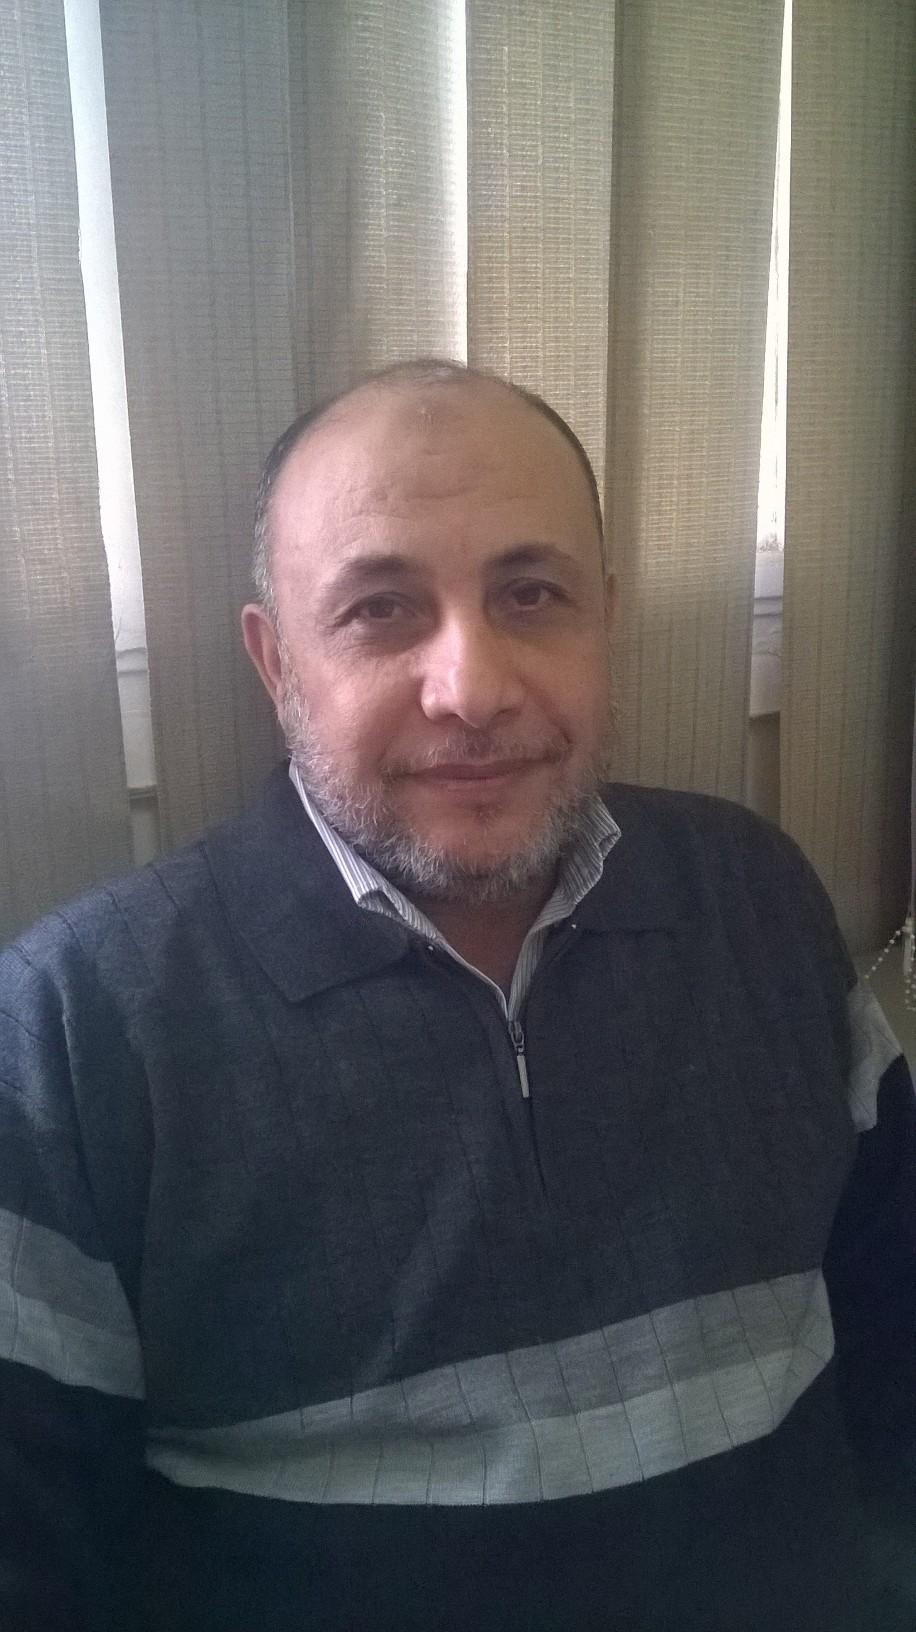 Mostafa Ibrahim Gouda Ali